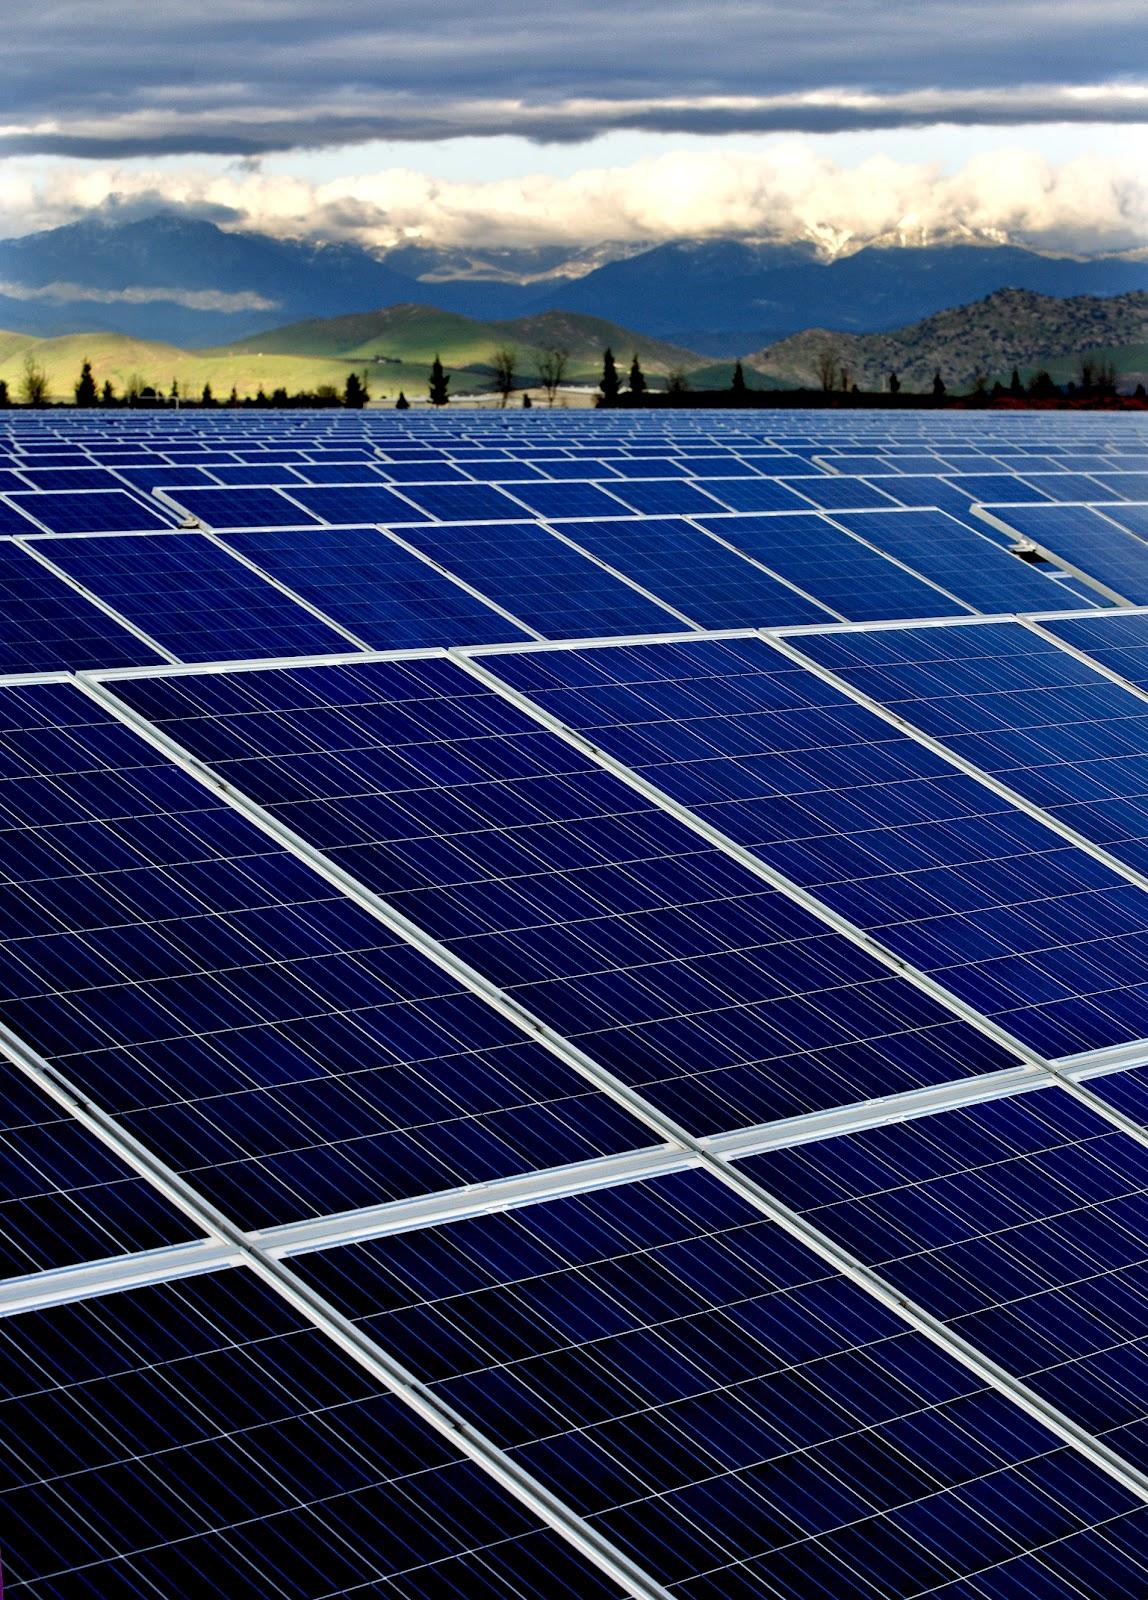 http://3.bp.blogspot.com/-4zWVYfQSwTo/T6UtXplUBgI/AAAAAAAAAIs/xuvT-EAAPsM/s1600/energia-solar.jpg